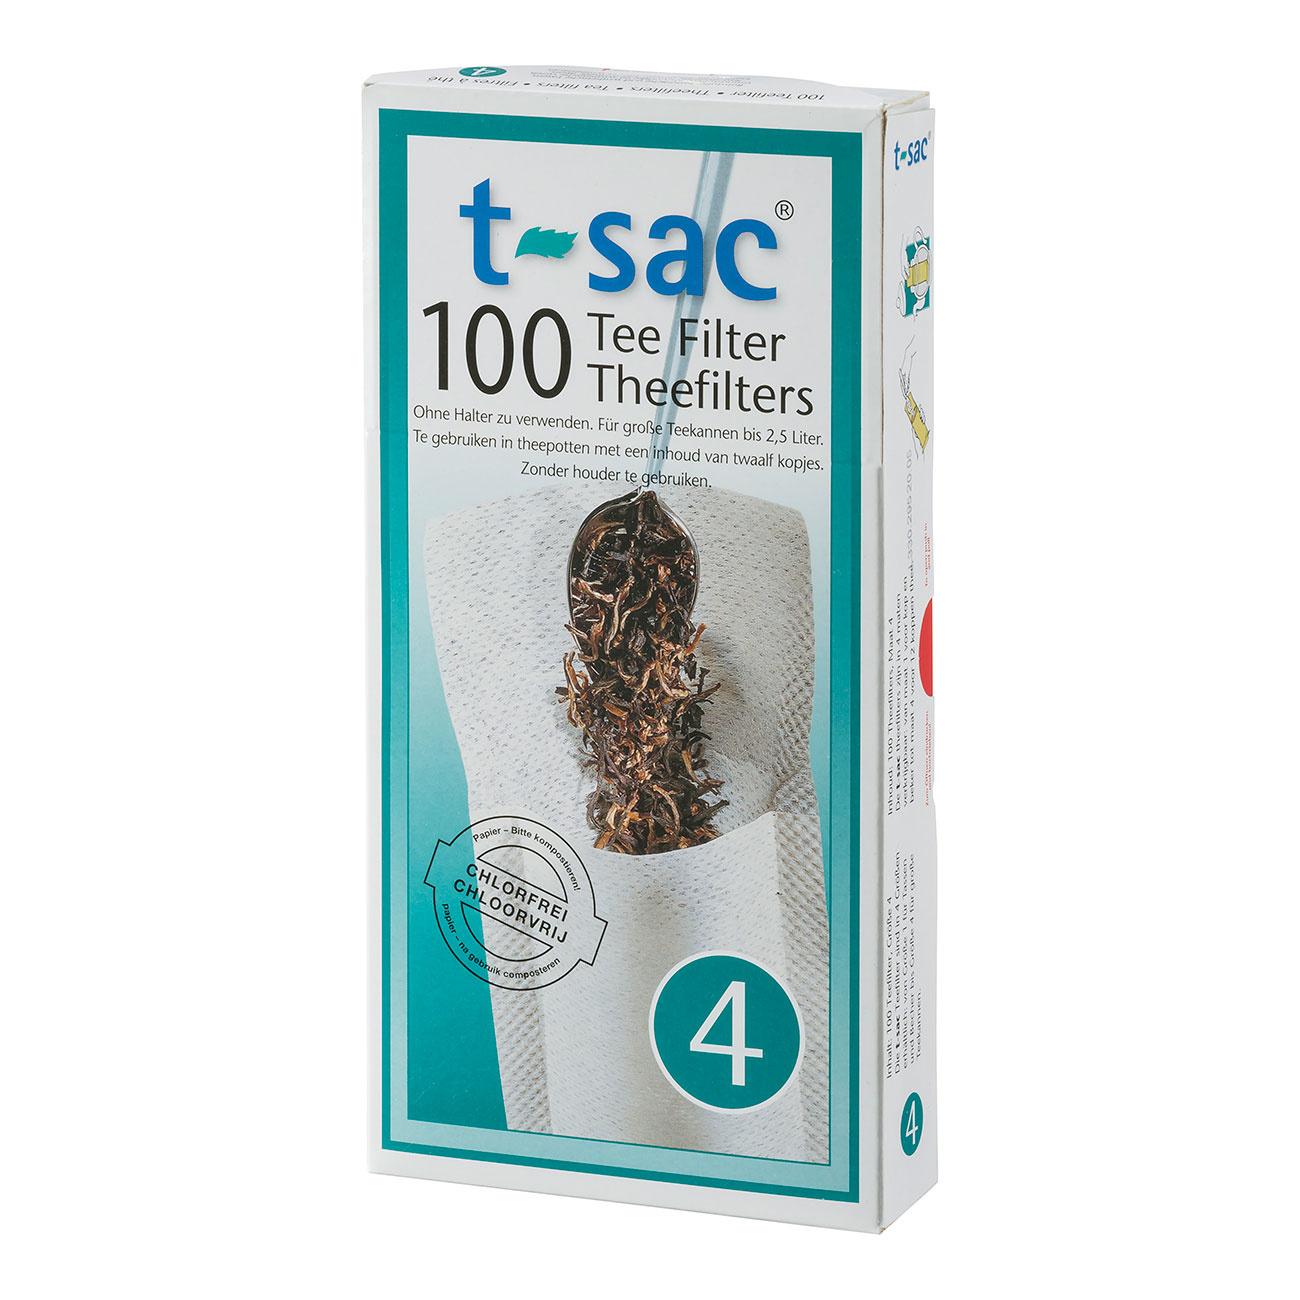 T-Sac theefilter nr. 4 (100 stuks)